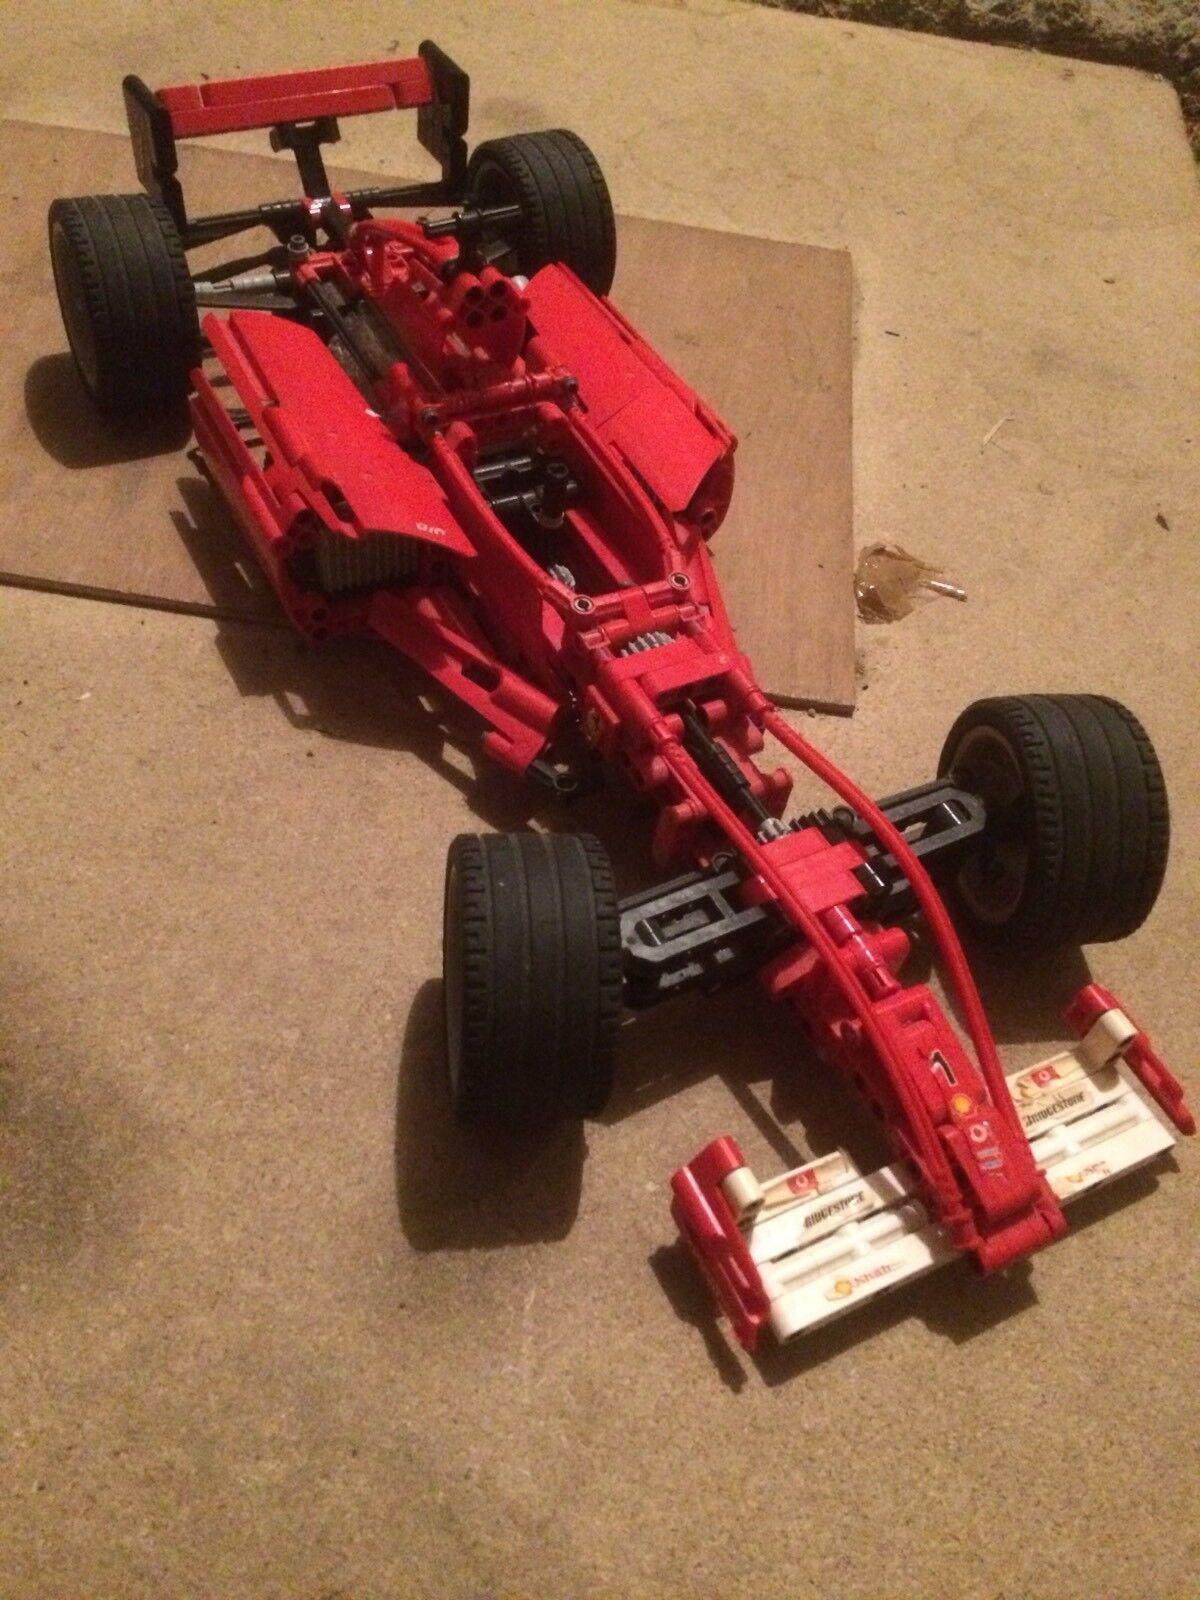 Lego tecnic 8386 ferrari